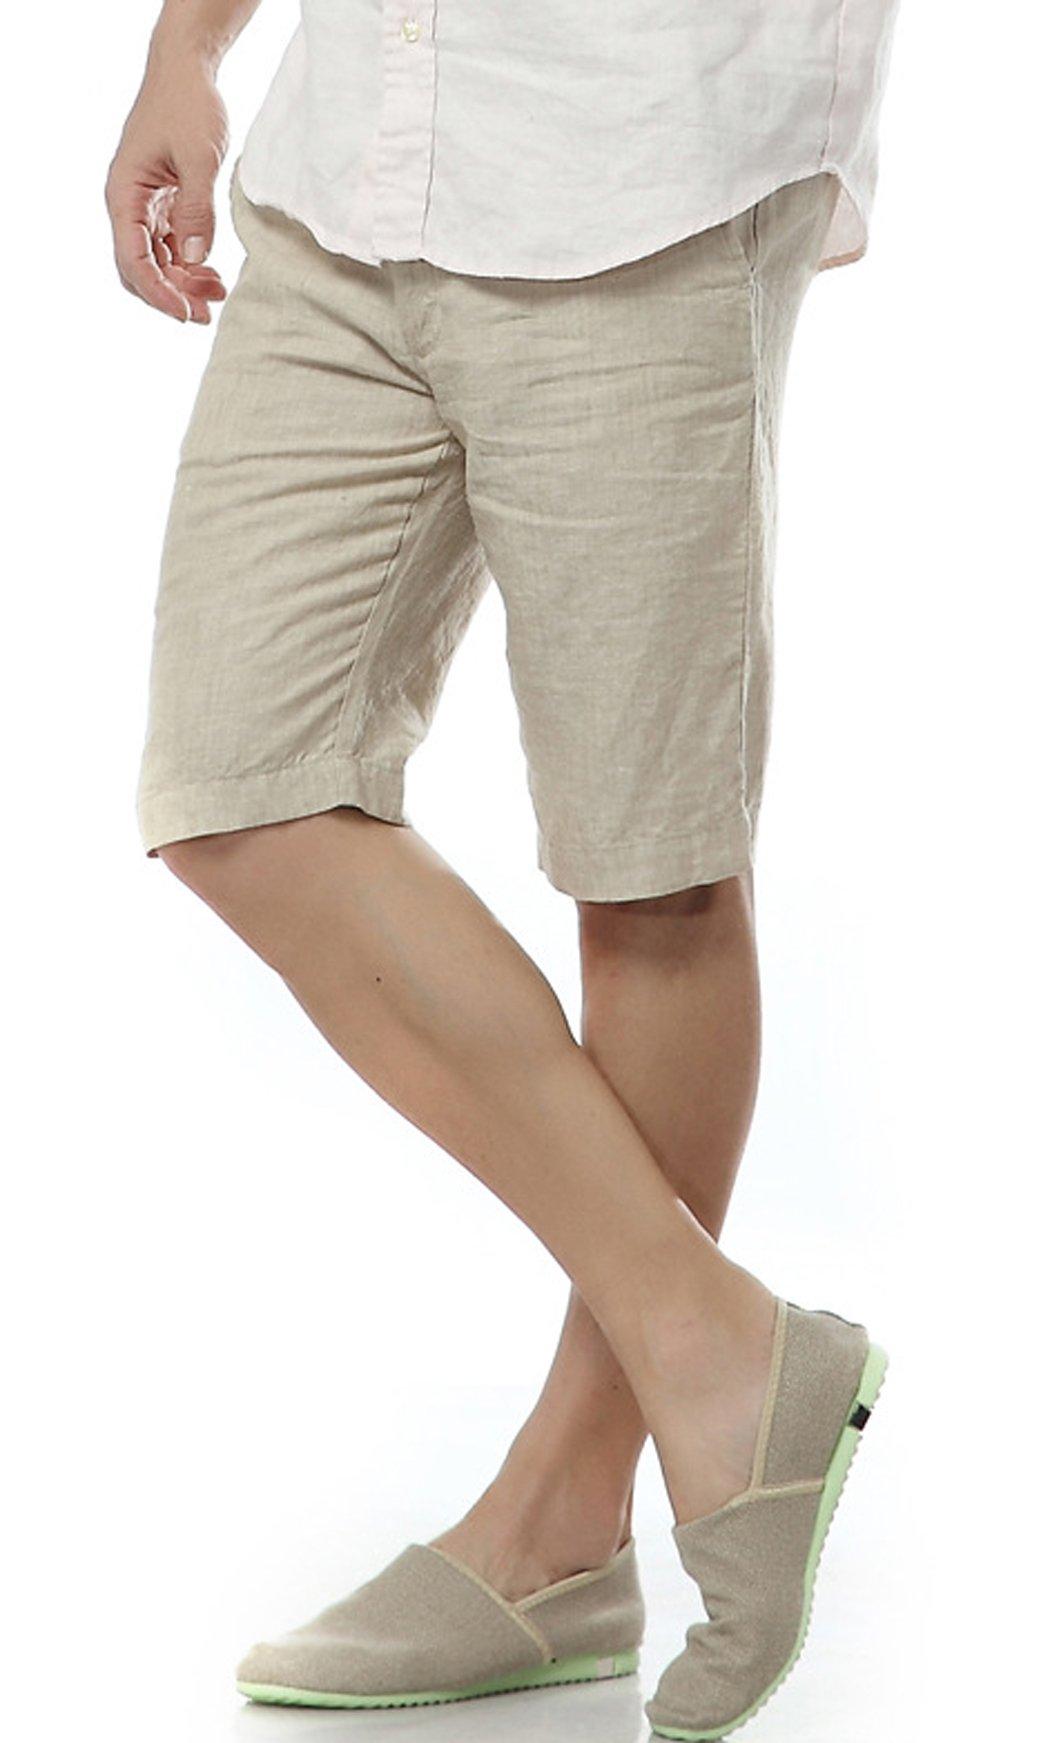 utcoco Men's Summer Straight Fit Flat-Front Linen Shorts (Medium, Khaki) by utcoco (Image #4)